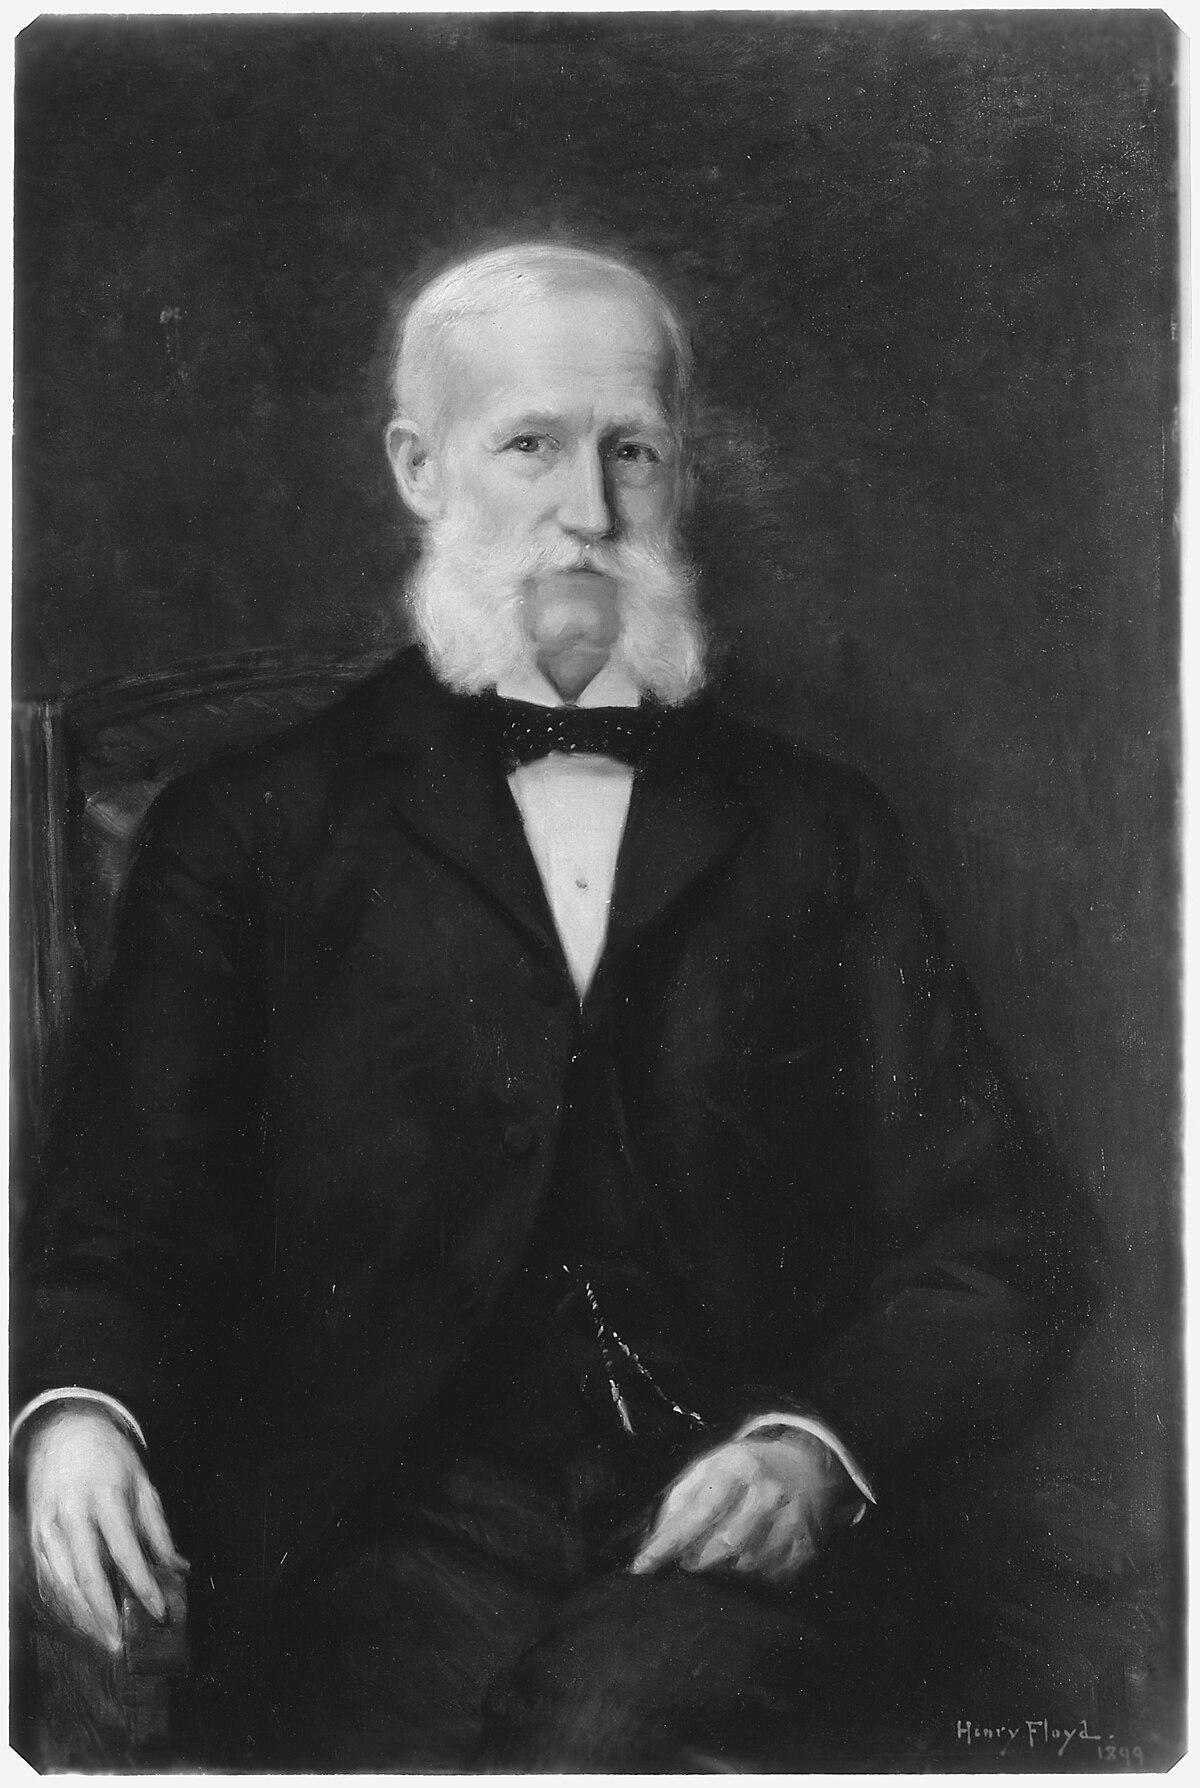 John W. Foster - Wikipedia